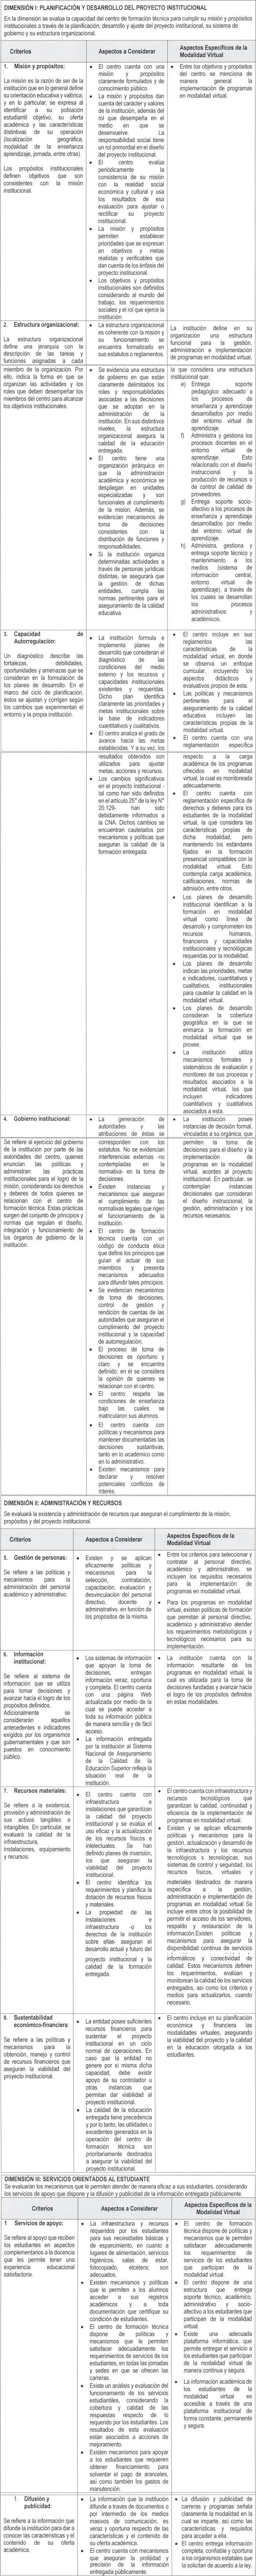 RES-4 05-DIC-2017 COMISIÓN NACIONAL DE ACREDITACIÓN - Ley Chile ...